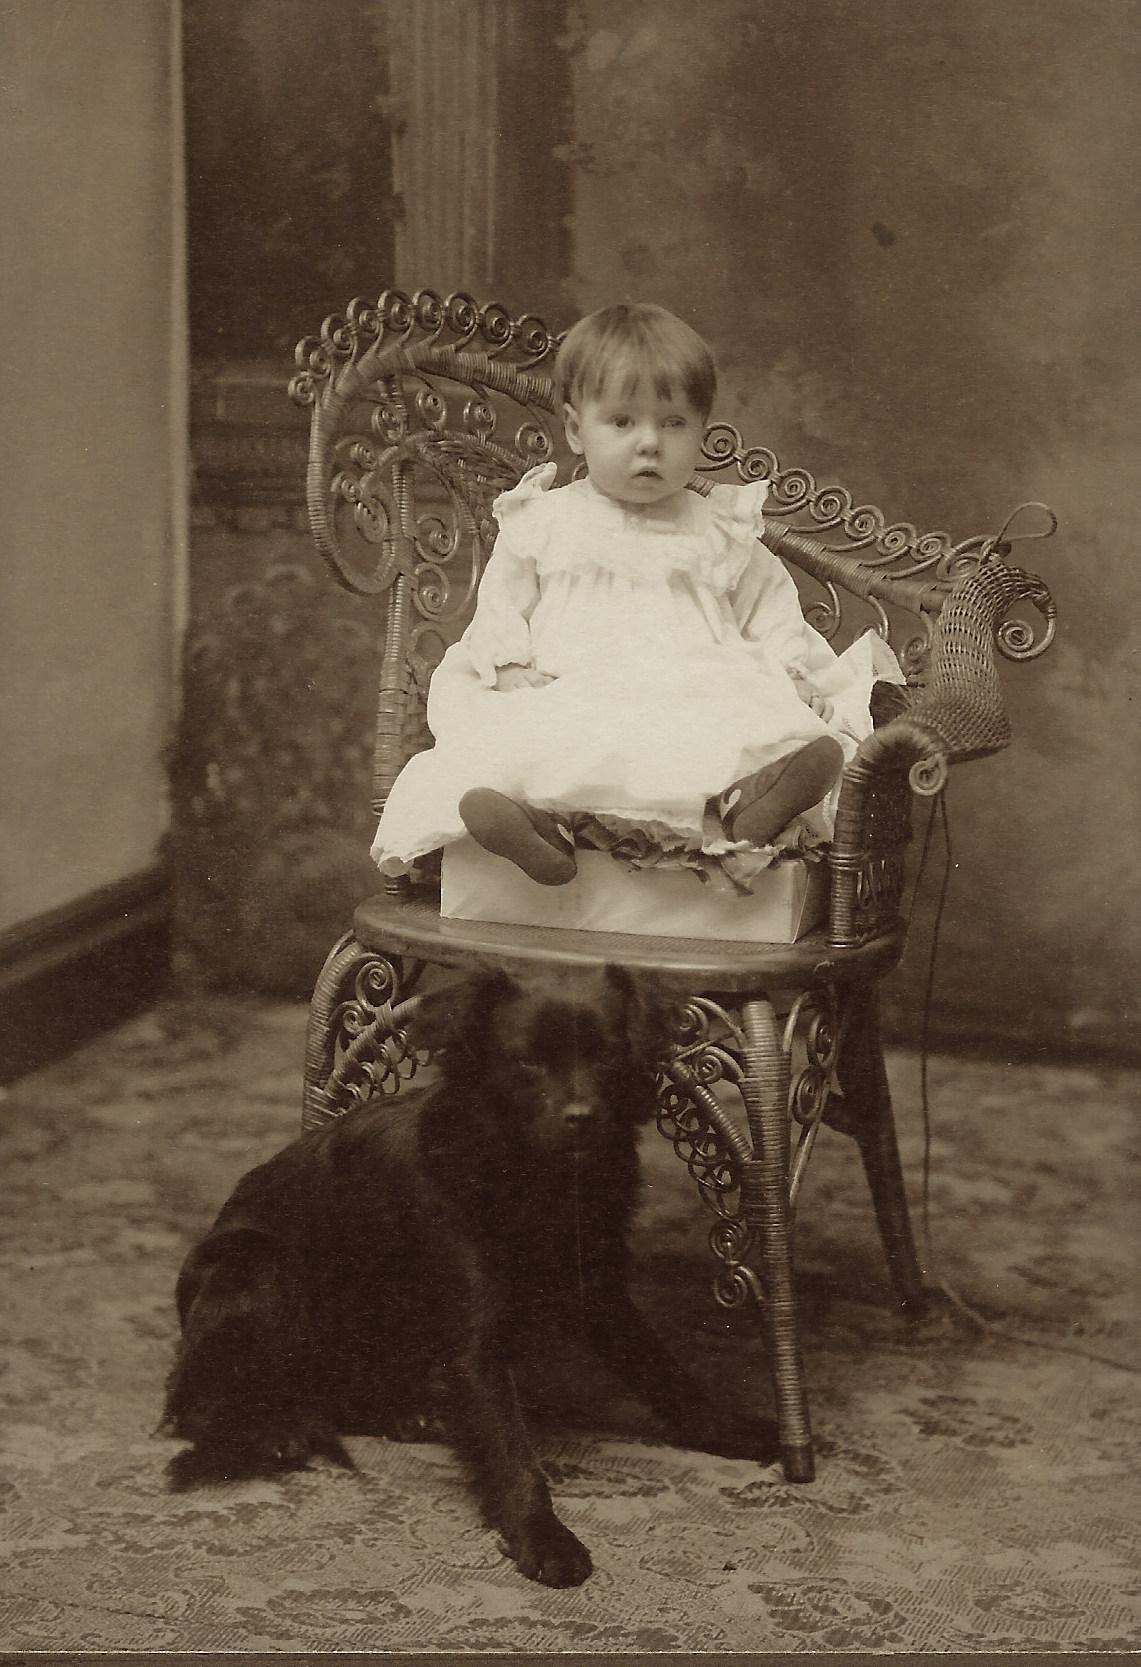 dog-and-kid-1